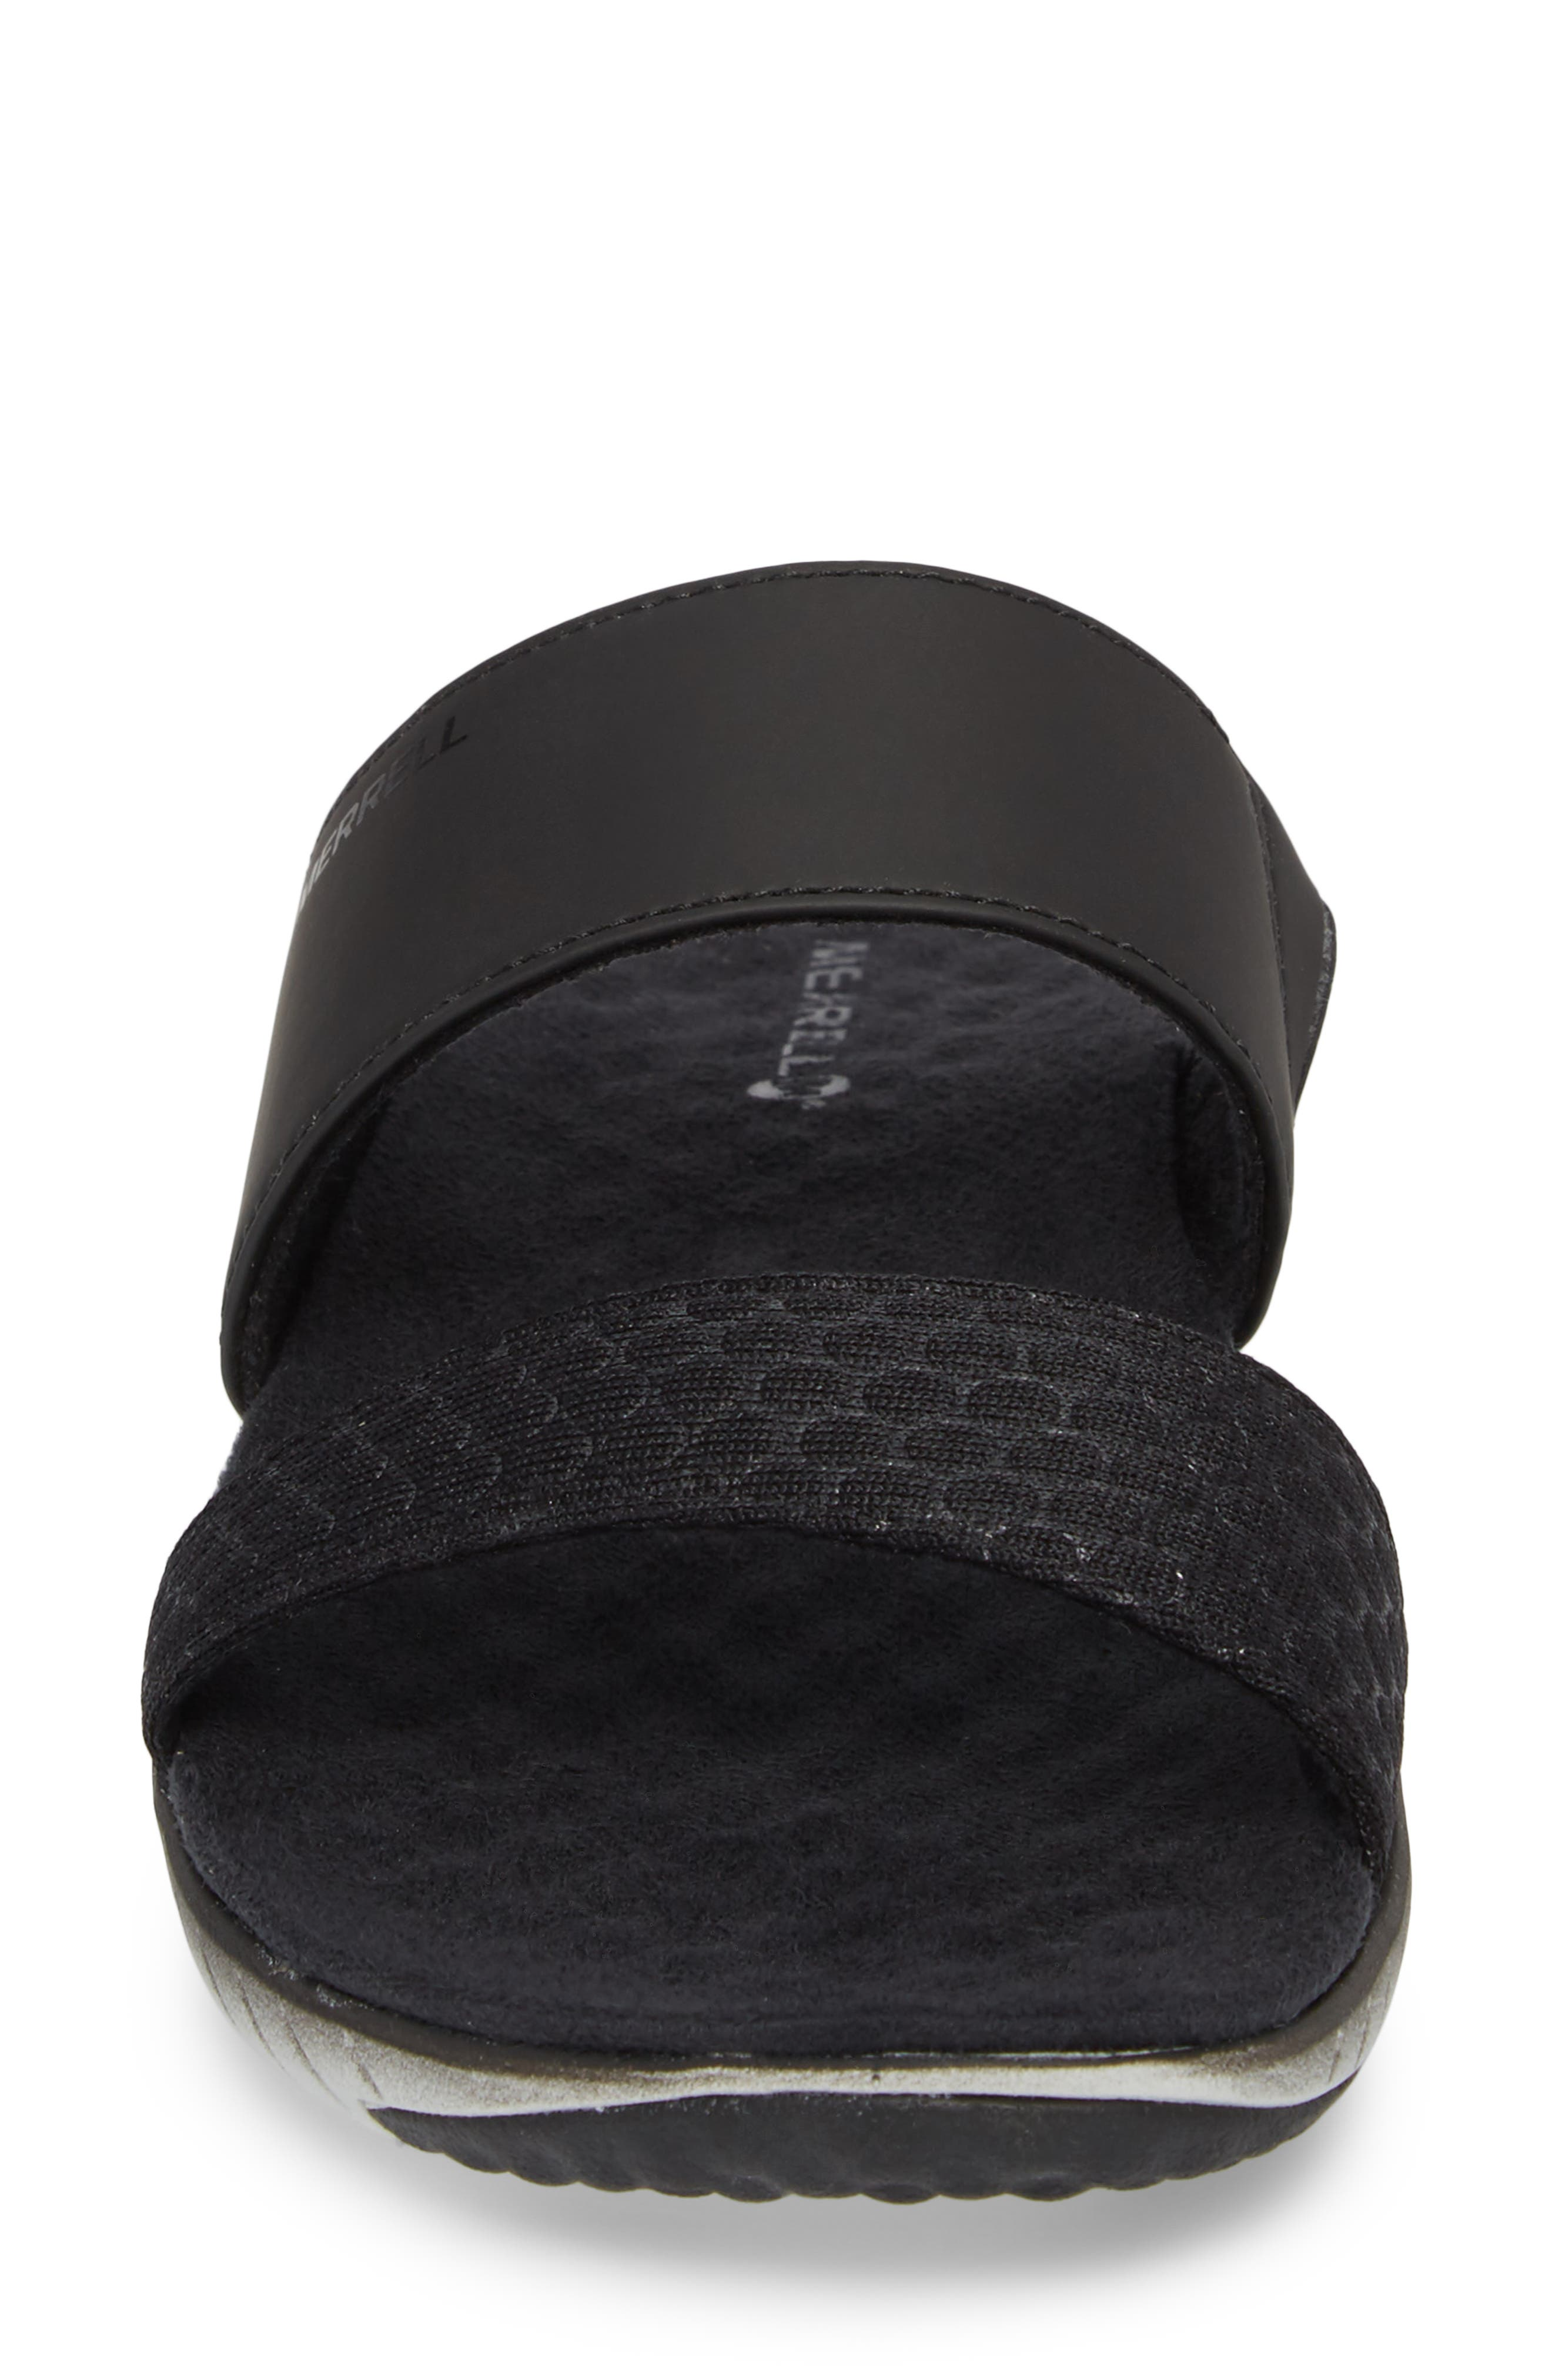 1SIX8 Linna Air Cushion+ Slide Sandal,                             Alternate thumbnail 13, color,